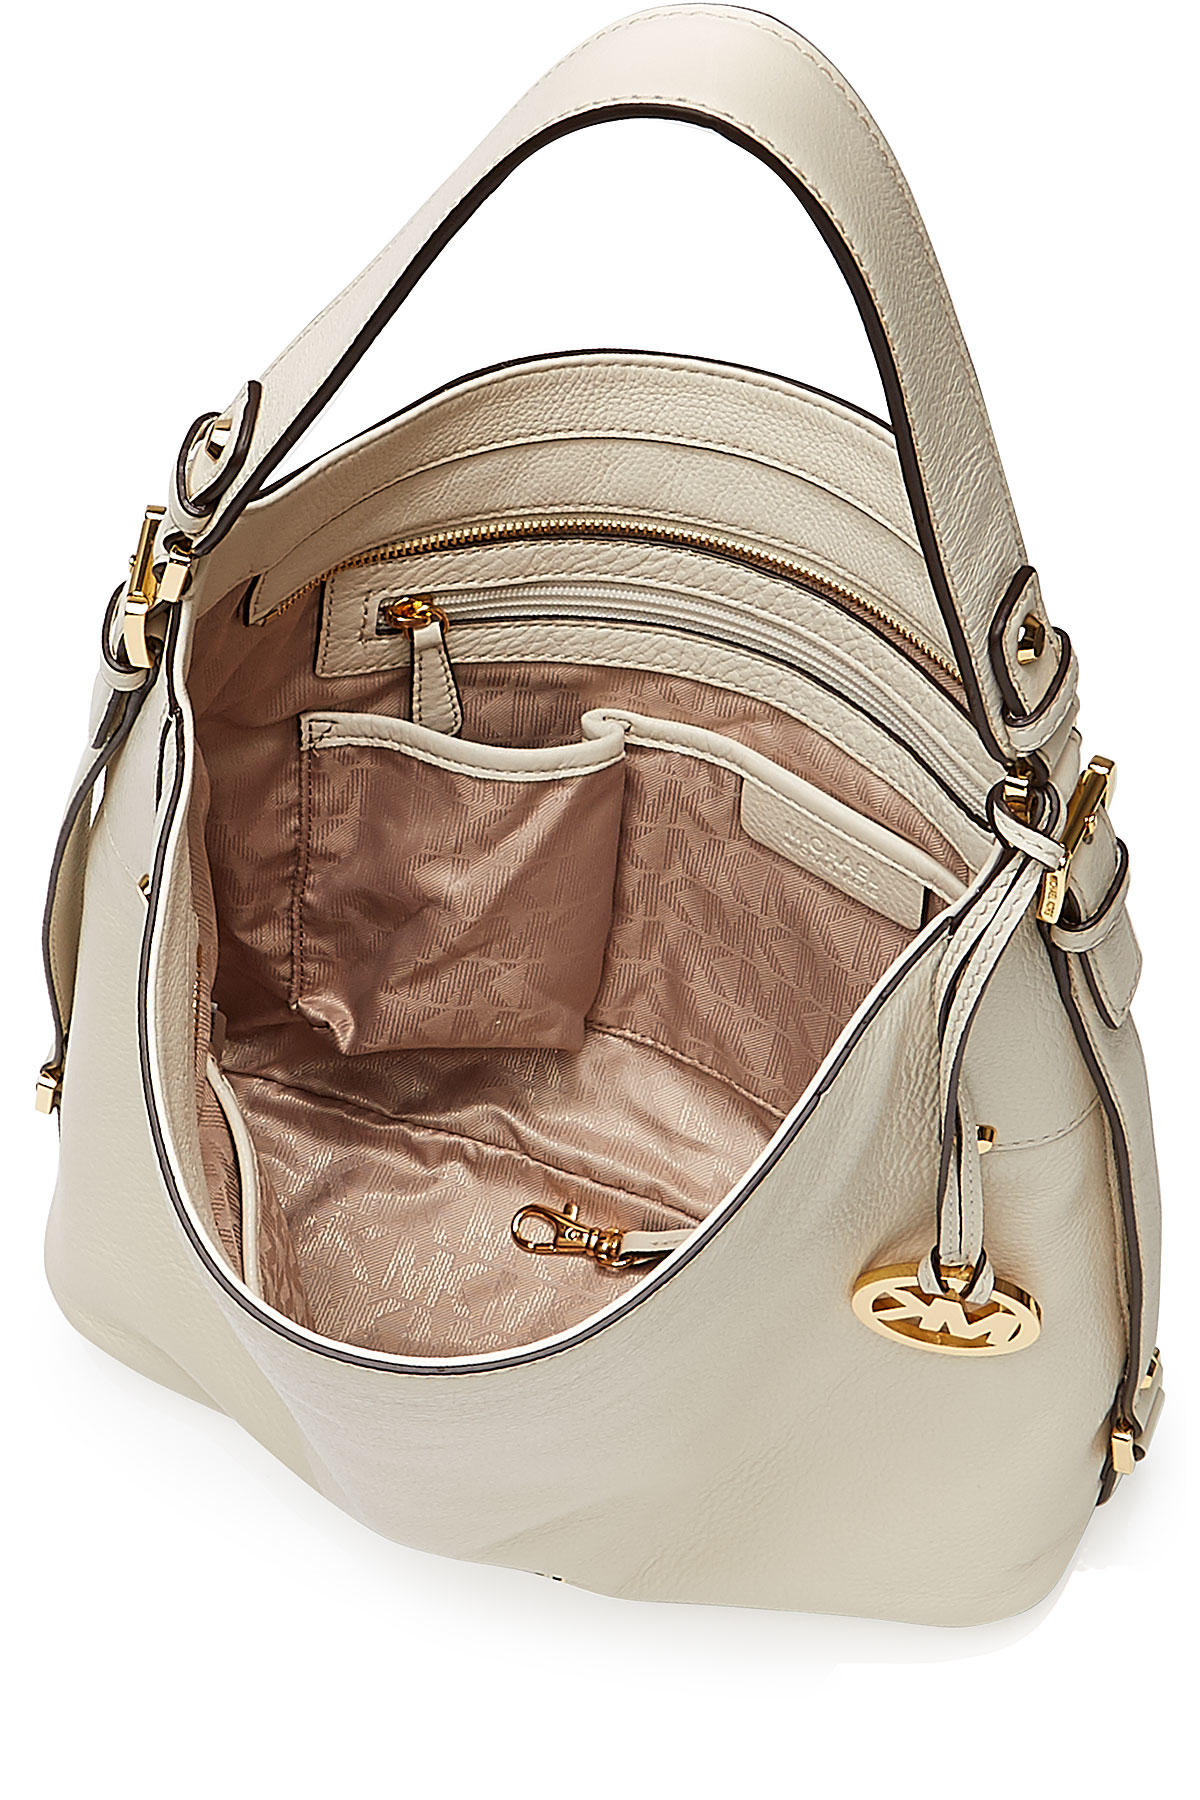 4258eea06e8007 MICHAEL Michael Kors Bedford Large Leather Shoulder Bag - White in ...